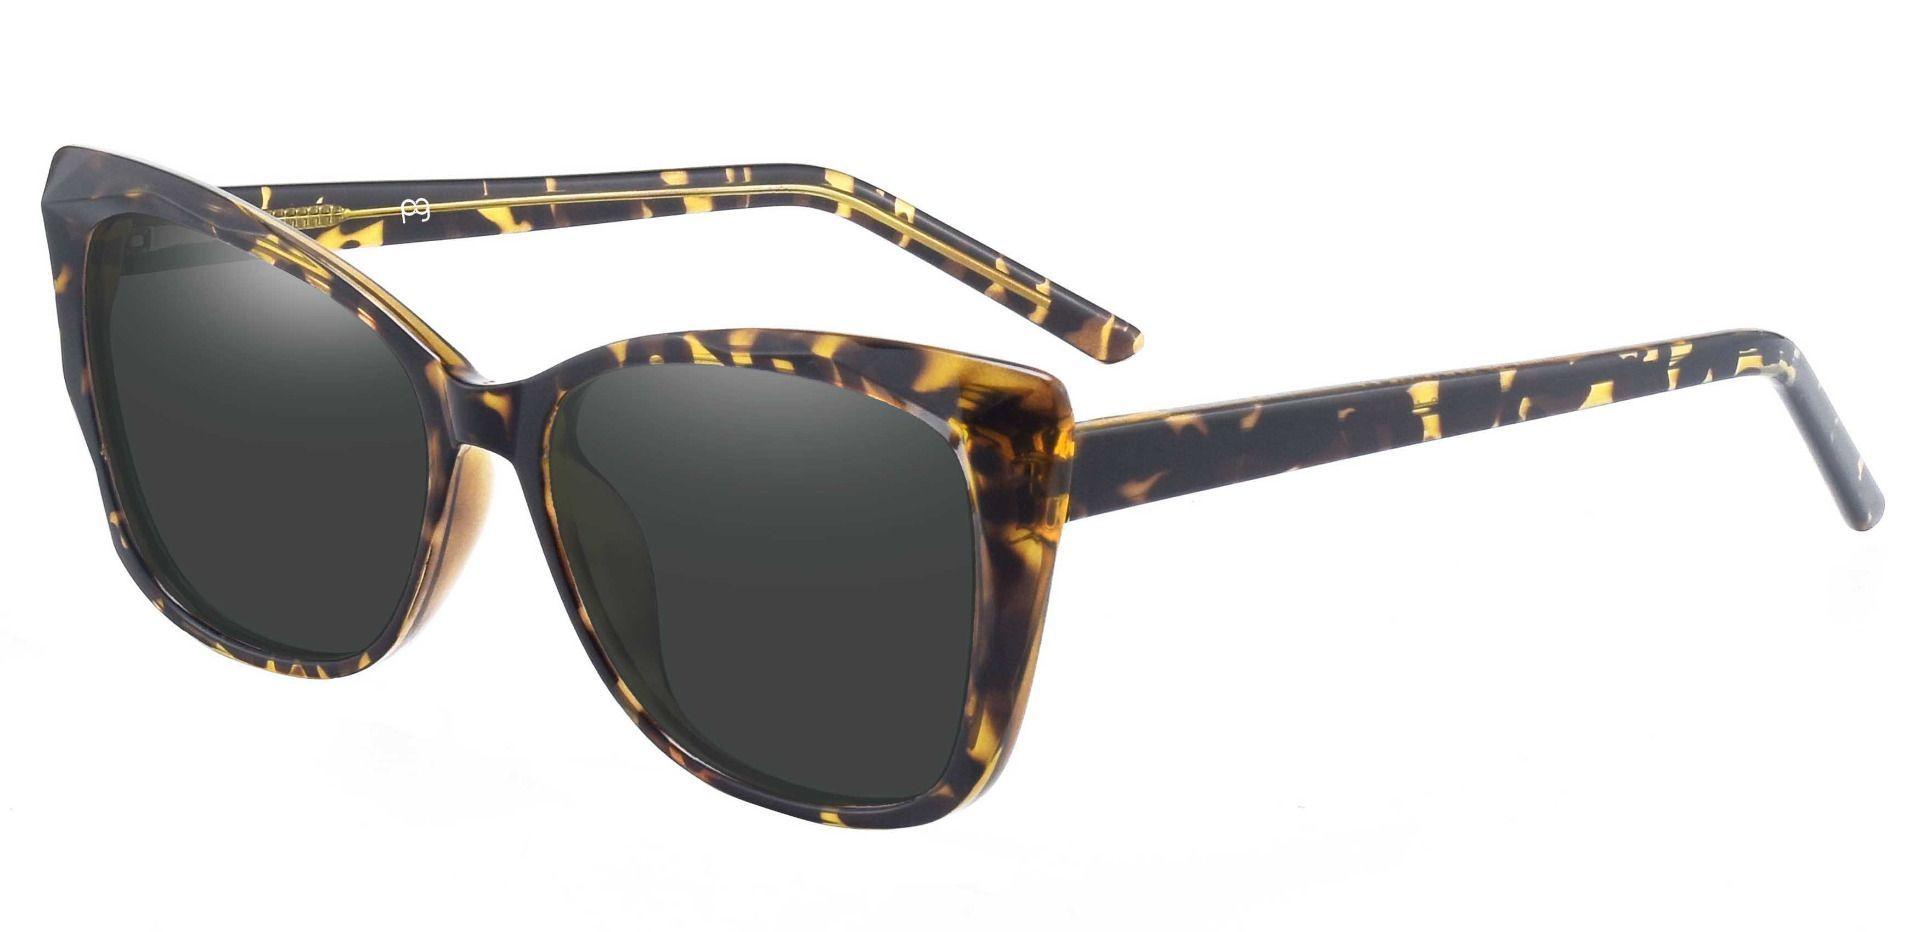 Mabel Square Progressive Sunglasses - Tortoise Frame With Gray Lenses